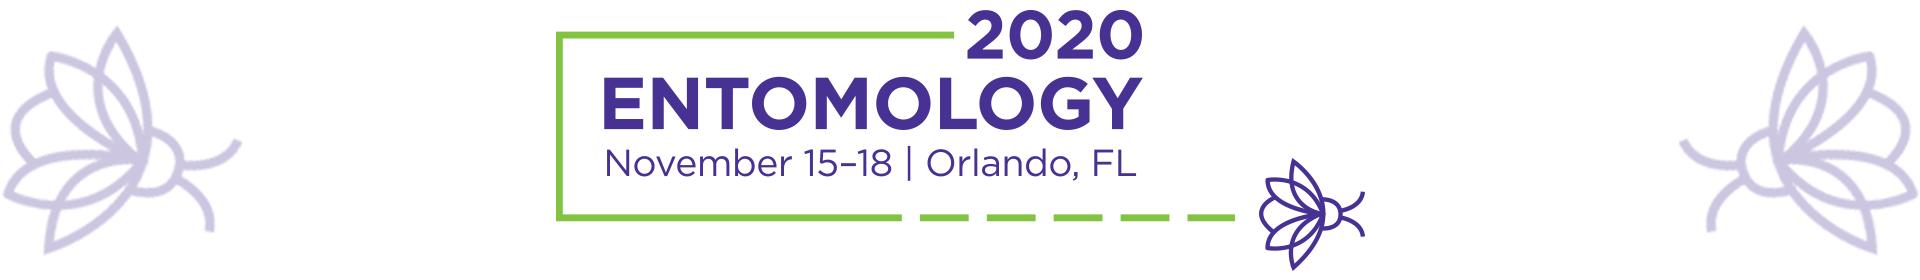 Entomology 2020 Event Banner